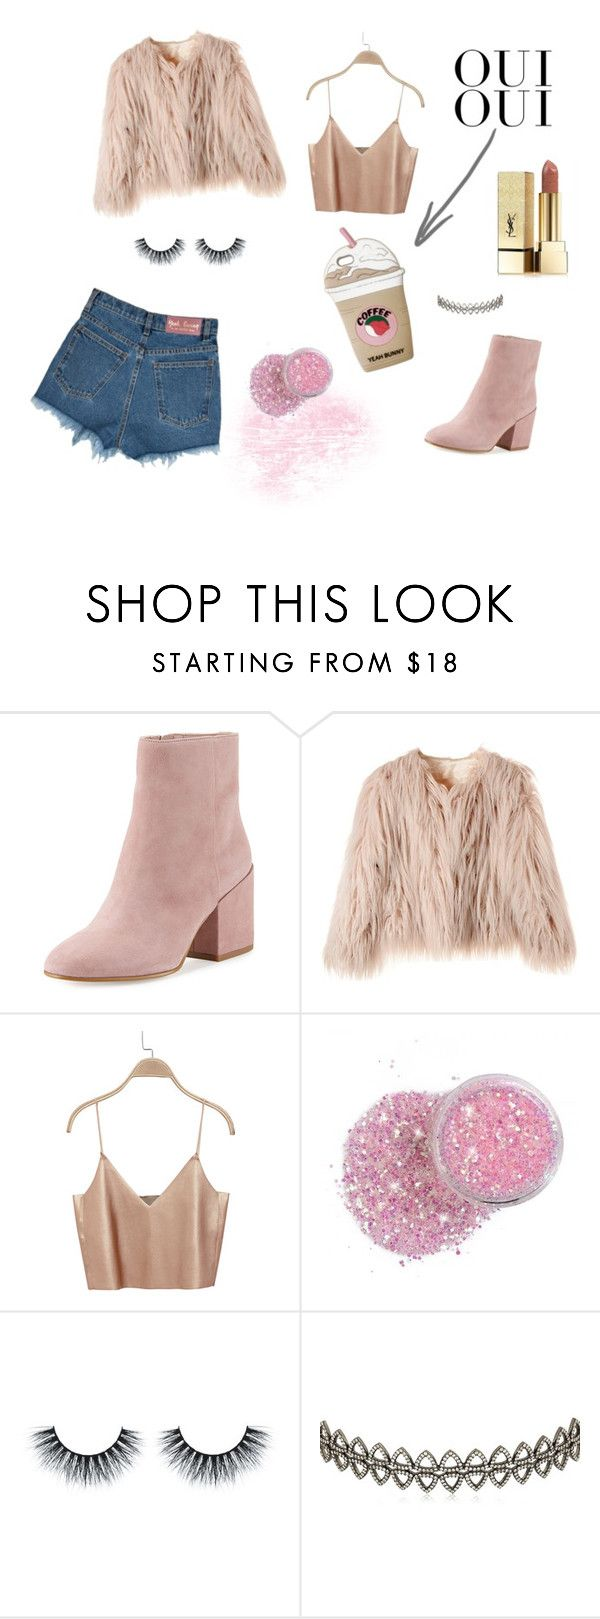 """YB pink"" by ellesdi on Polyvore featuring moda, Oui, Sam Edelman, Assya London i Yves Saint Laurent"